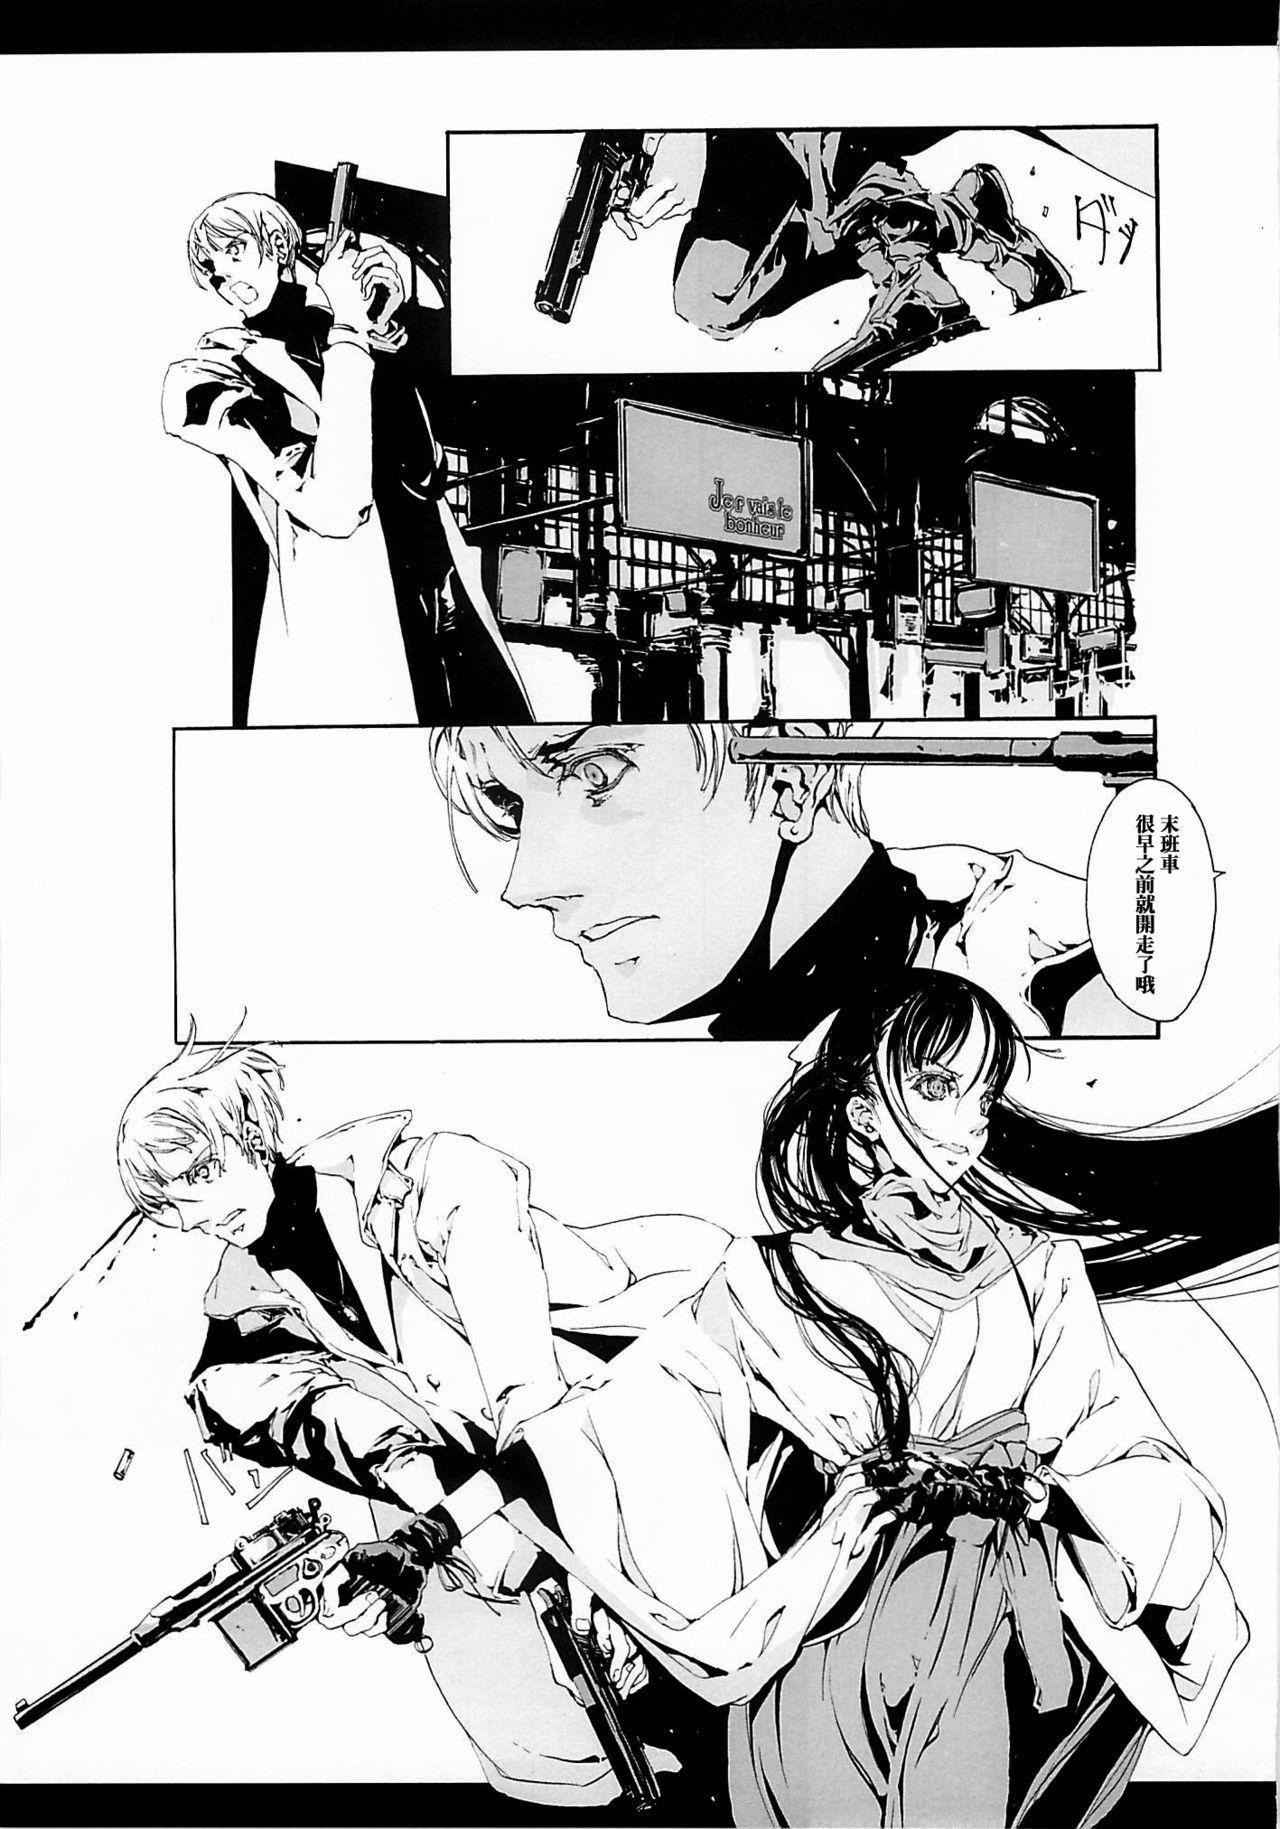 (CR37) [70 Nenshiki Yuukyuu Kikan (Endou Okito)] ORGAN-Tino  01-02[Chinese] [拾荒者汉化组] [Incomplete] 39